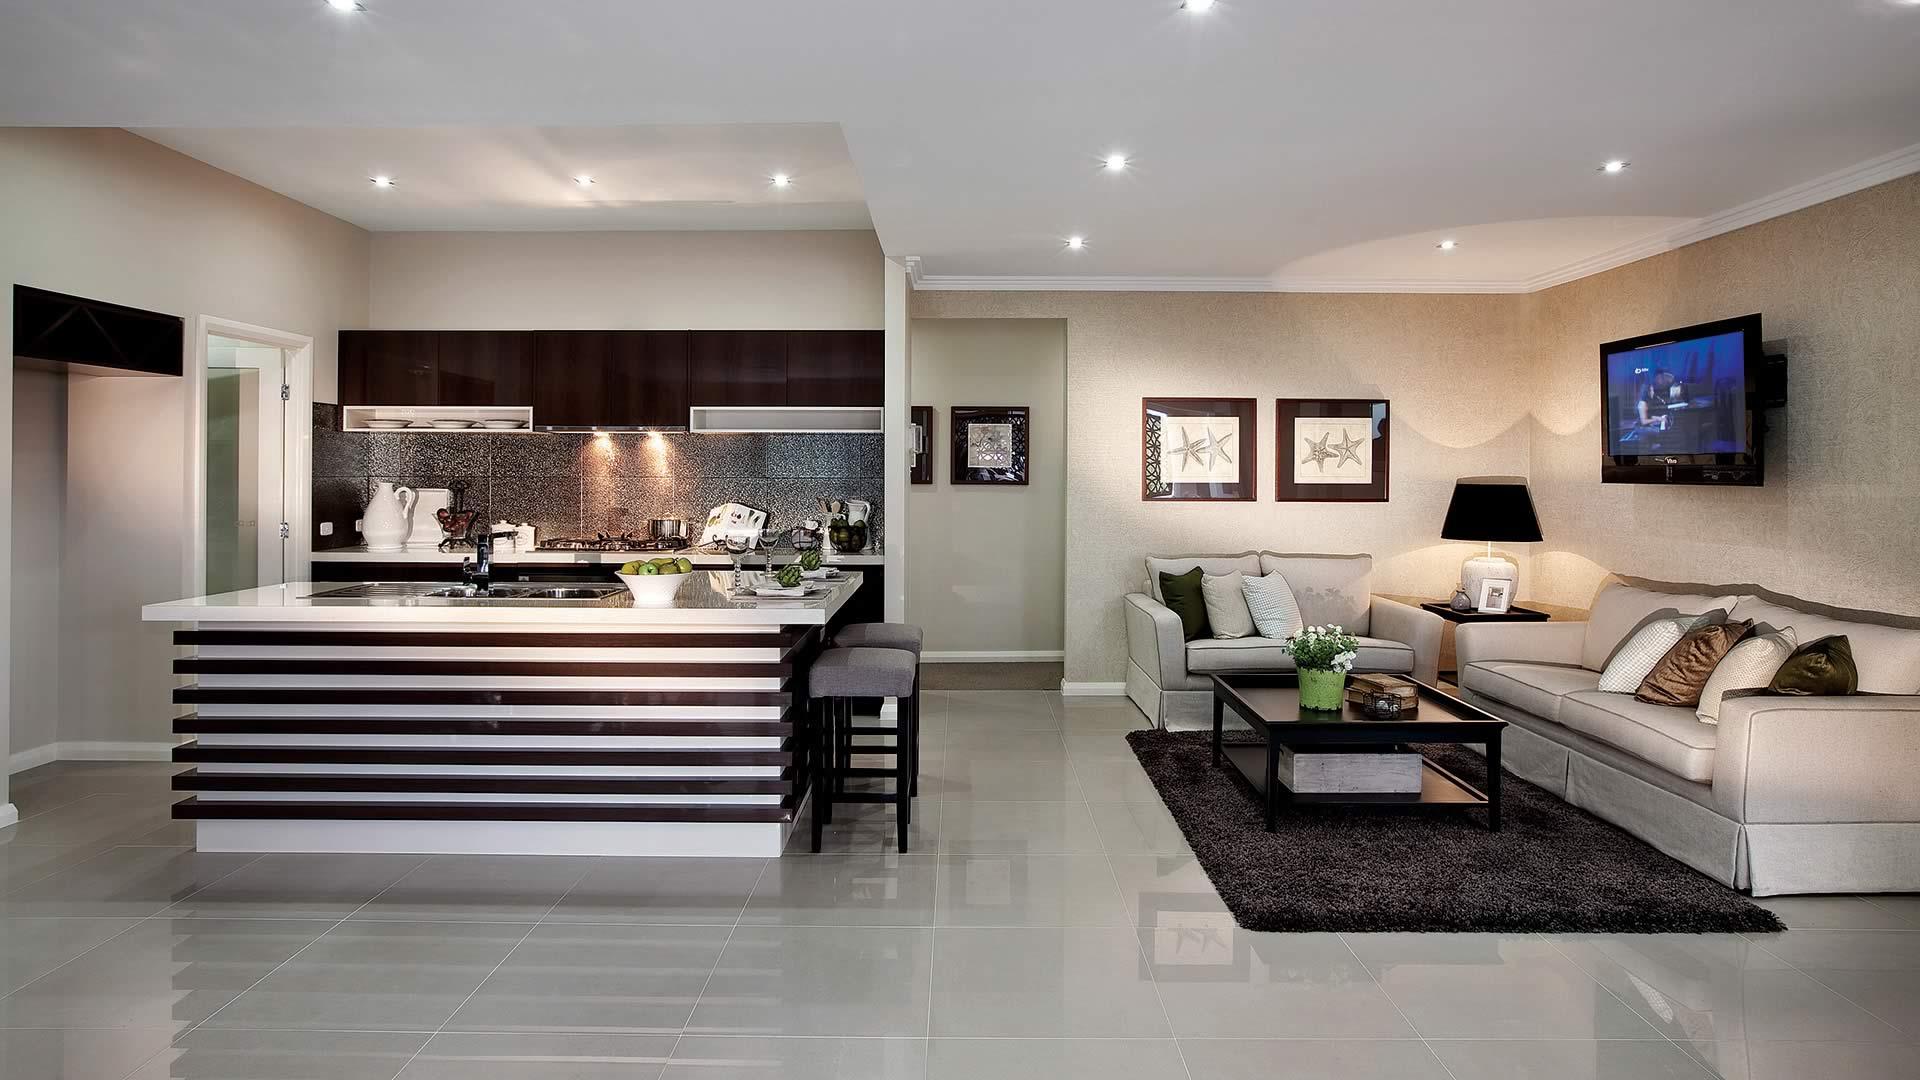 Hamilton Prestige Eden Brae Homes